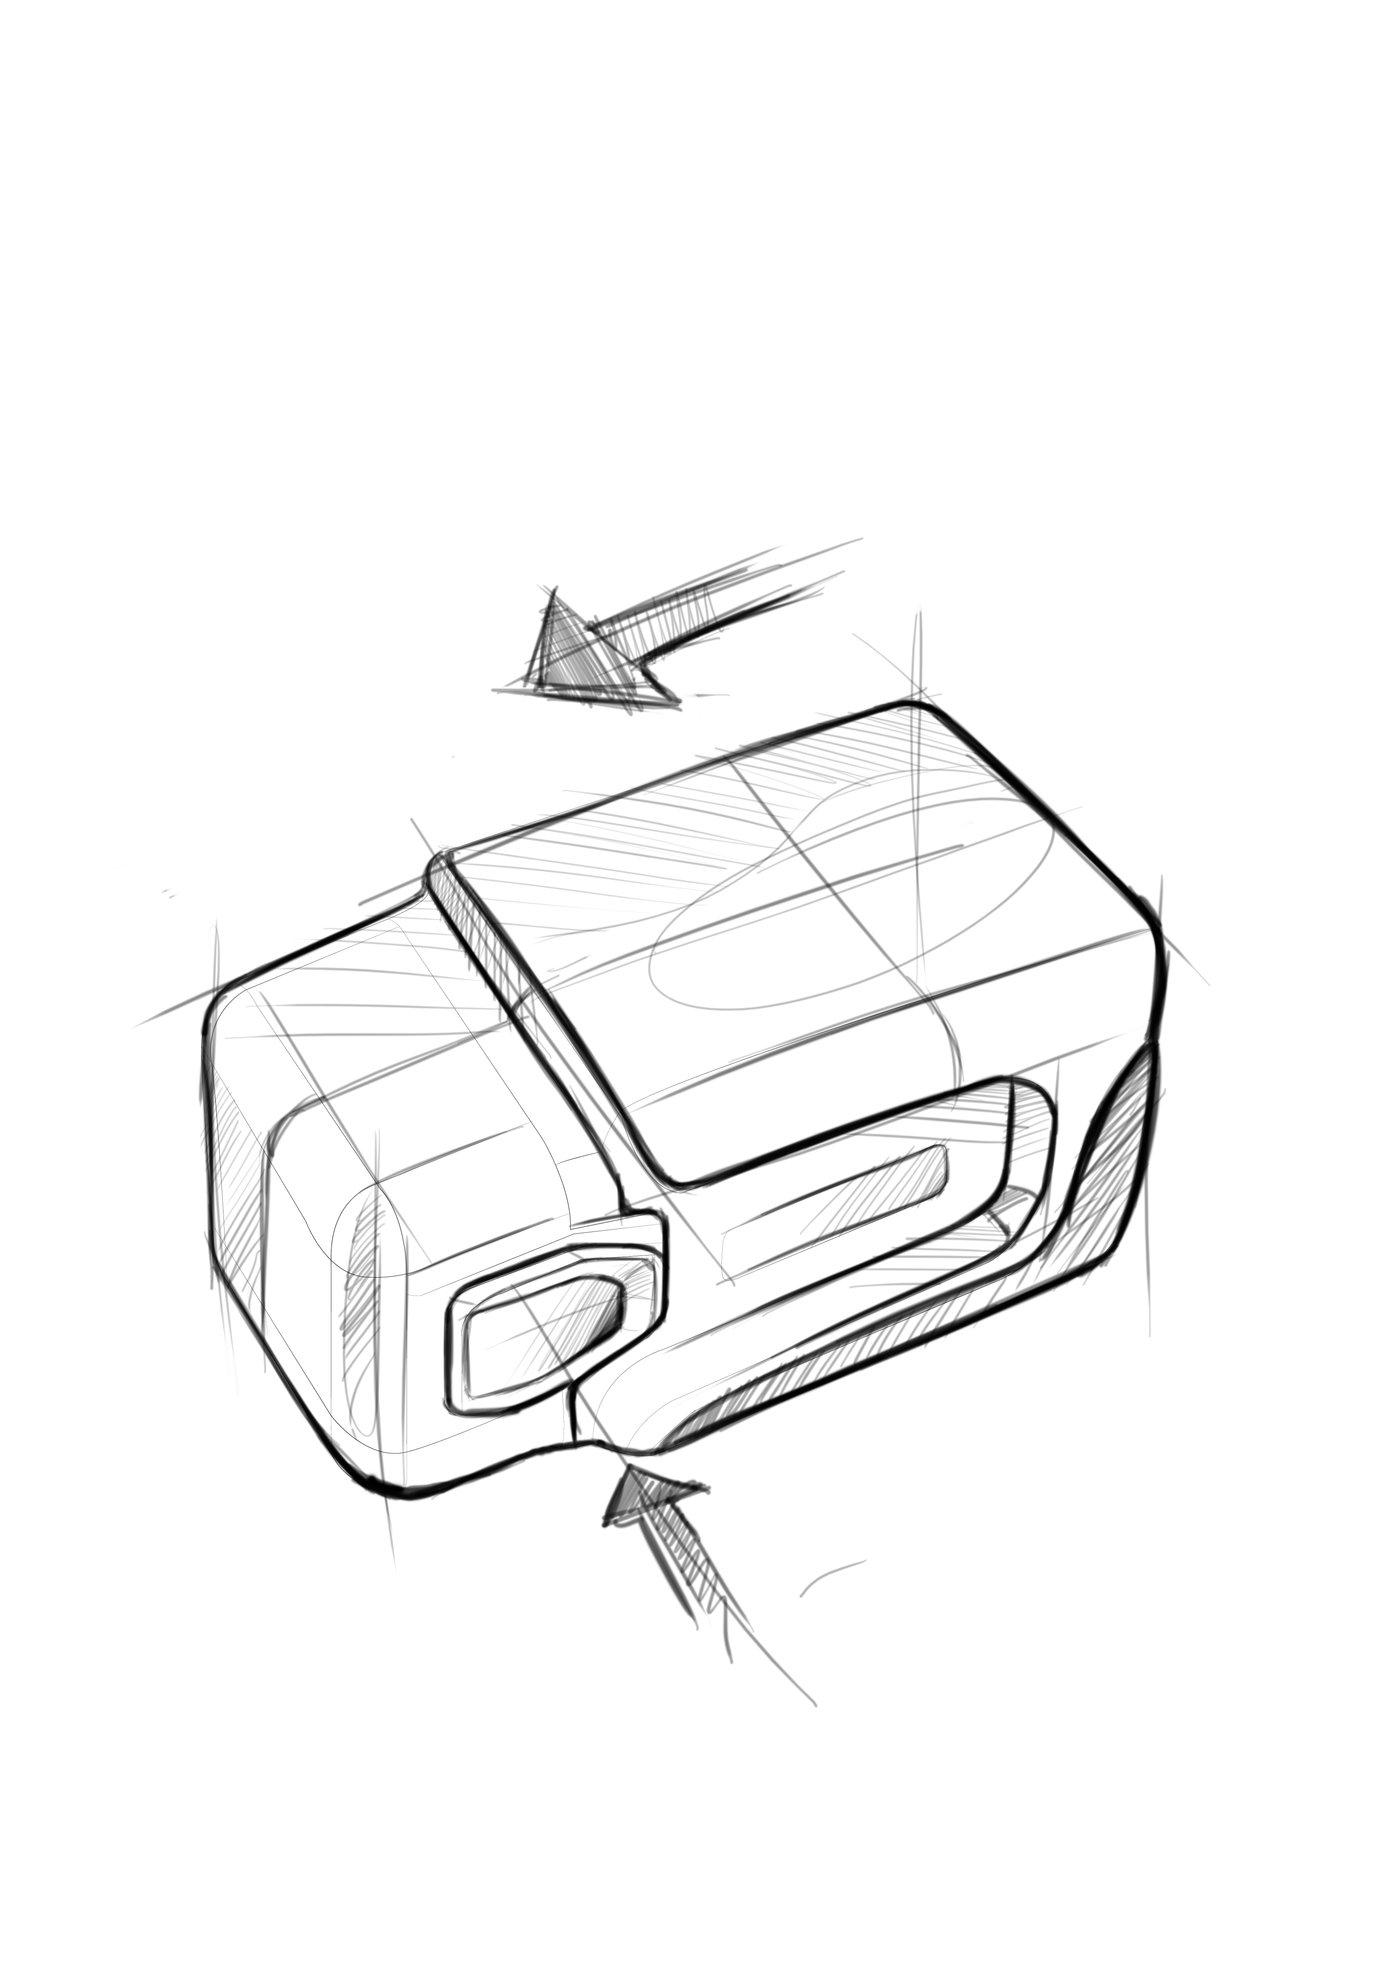 Audi Tt Roadster Fuse Box. Audi. Auto Fuse Box Diagram